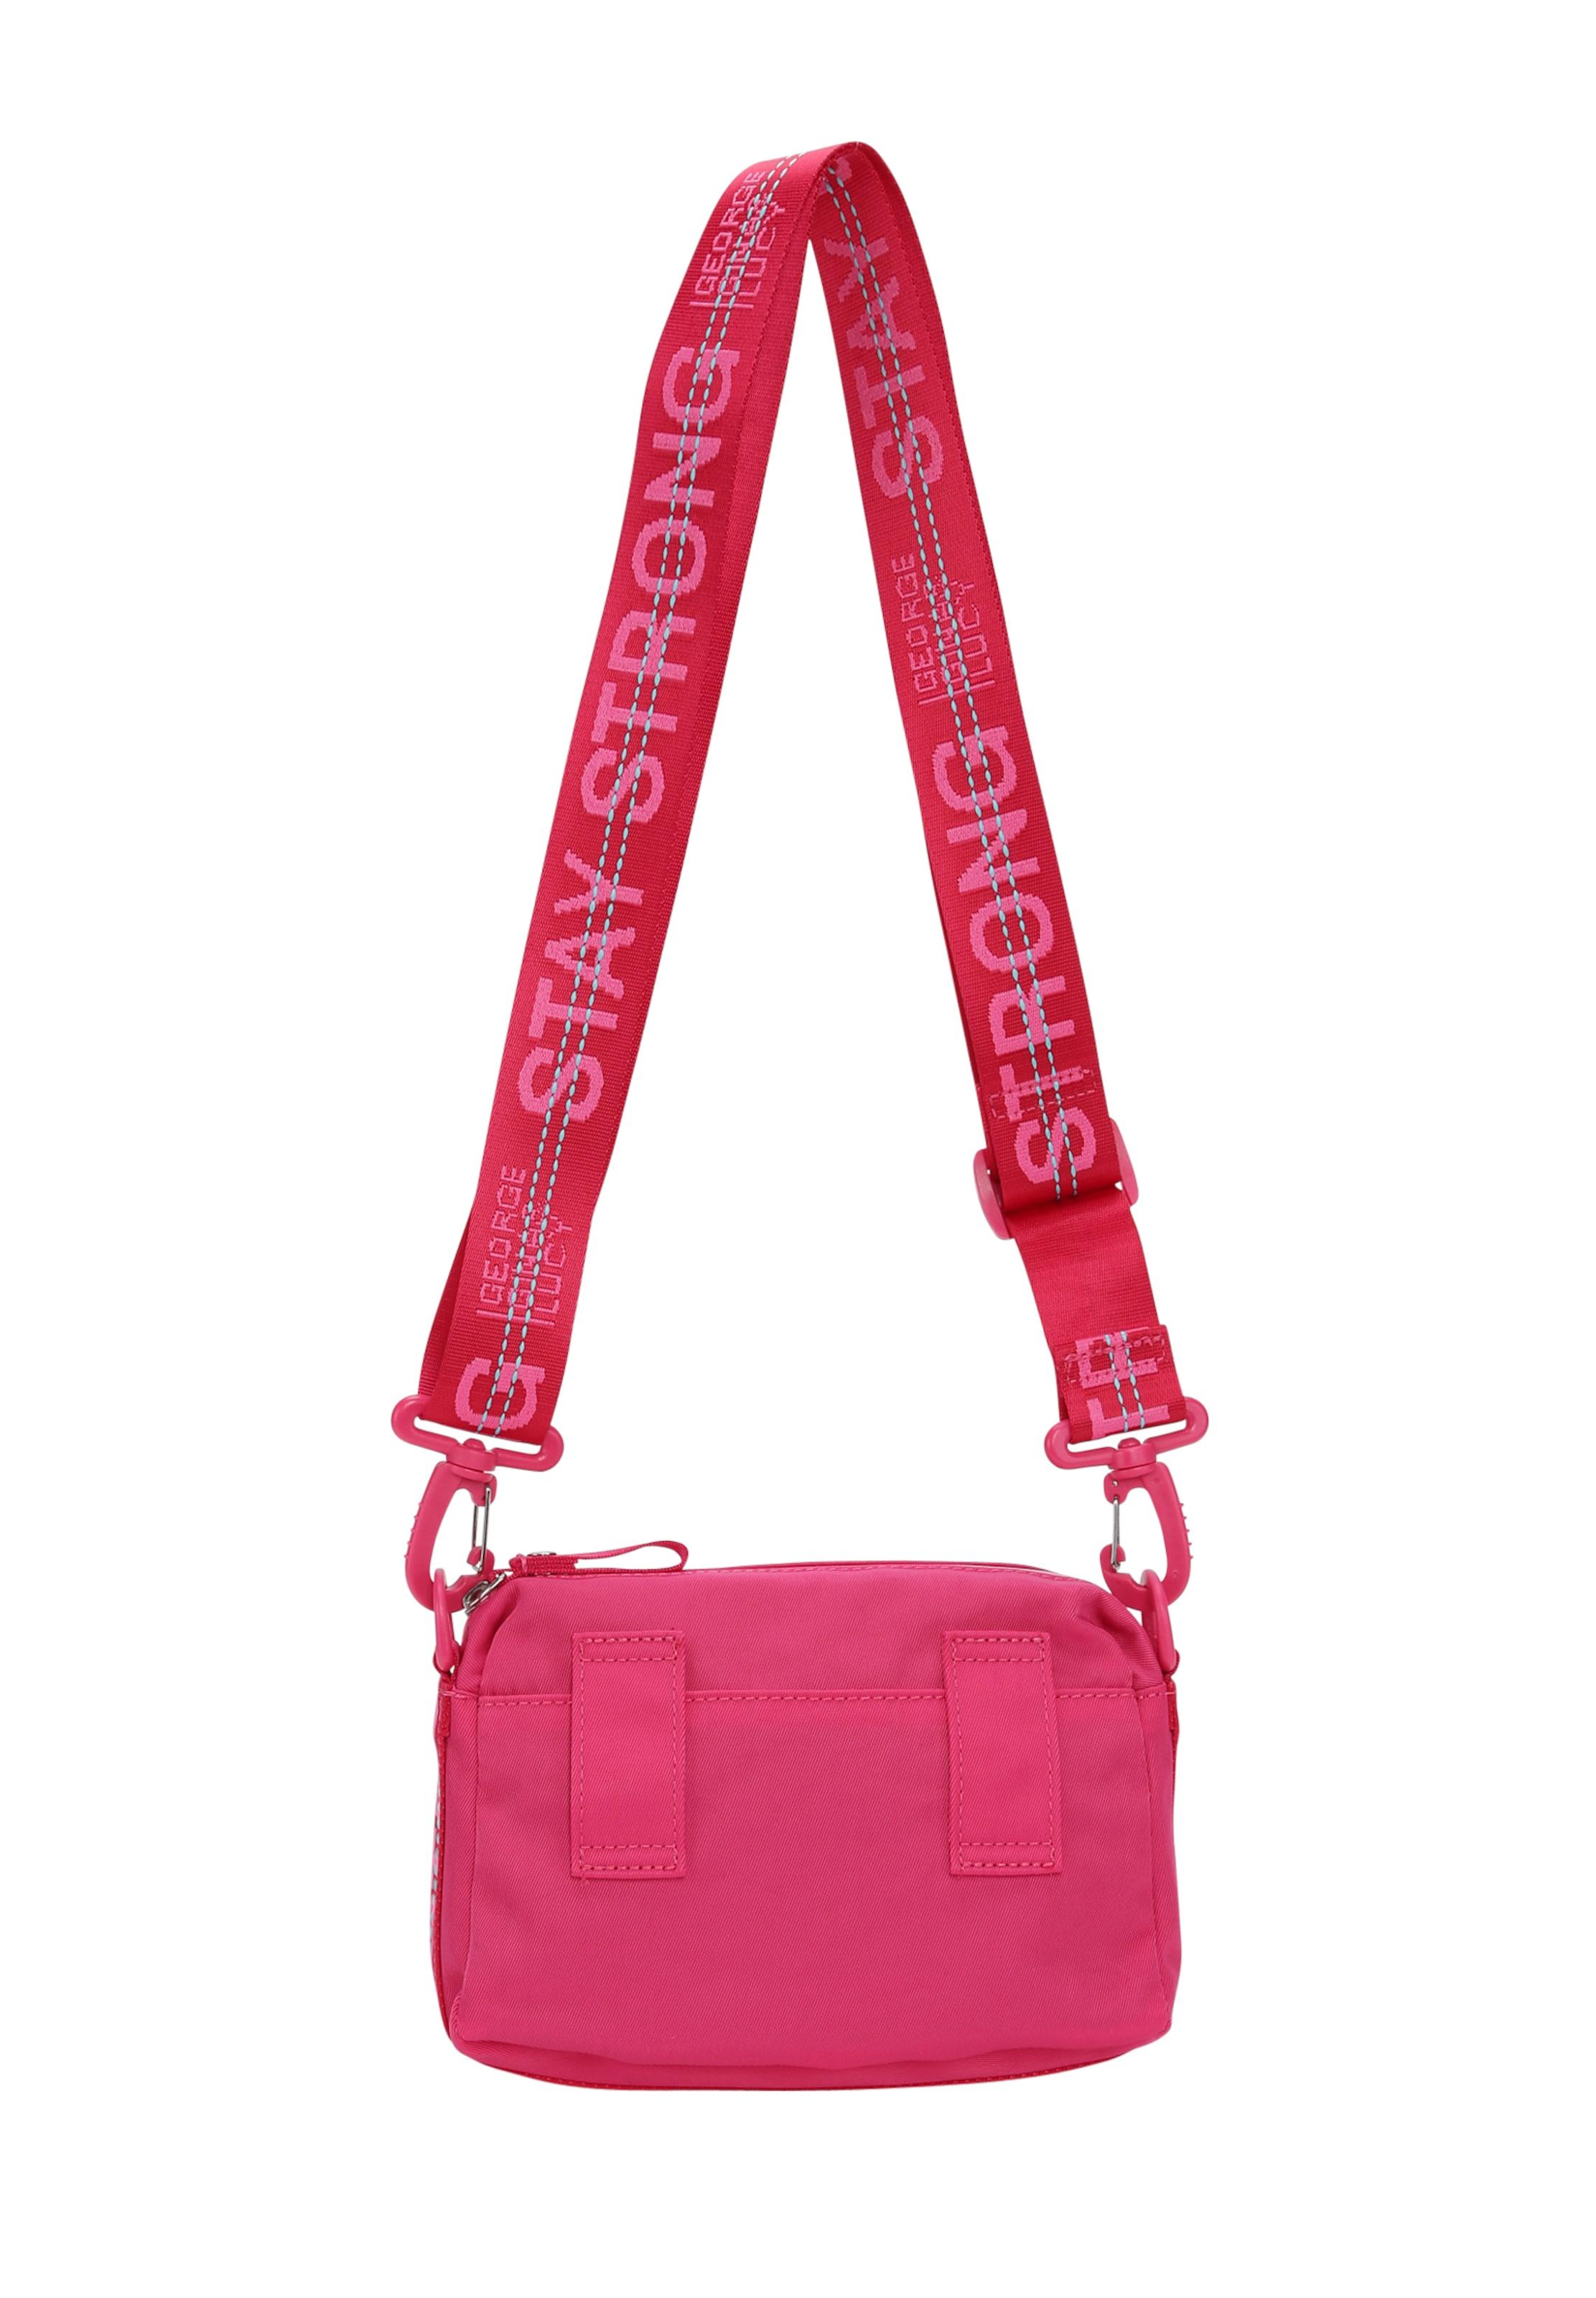 In 'yma' Bag Lucy Ginaamp; Crossbody Pink George Y7gyvbf6